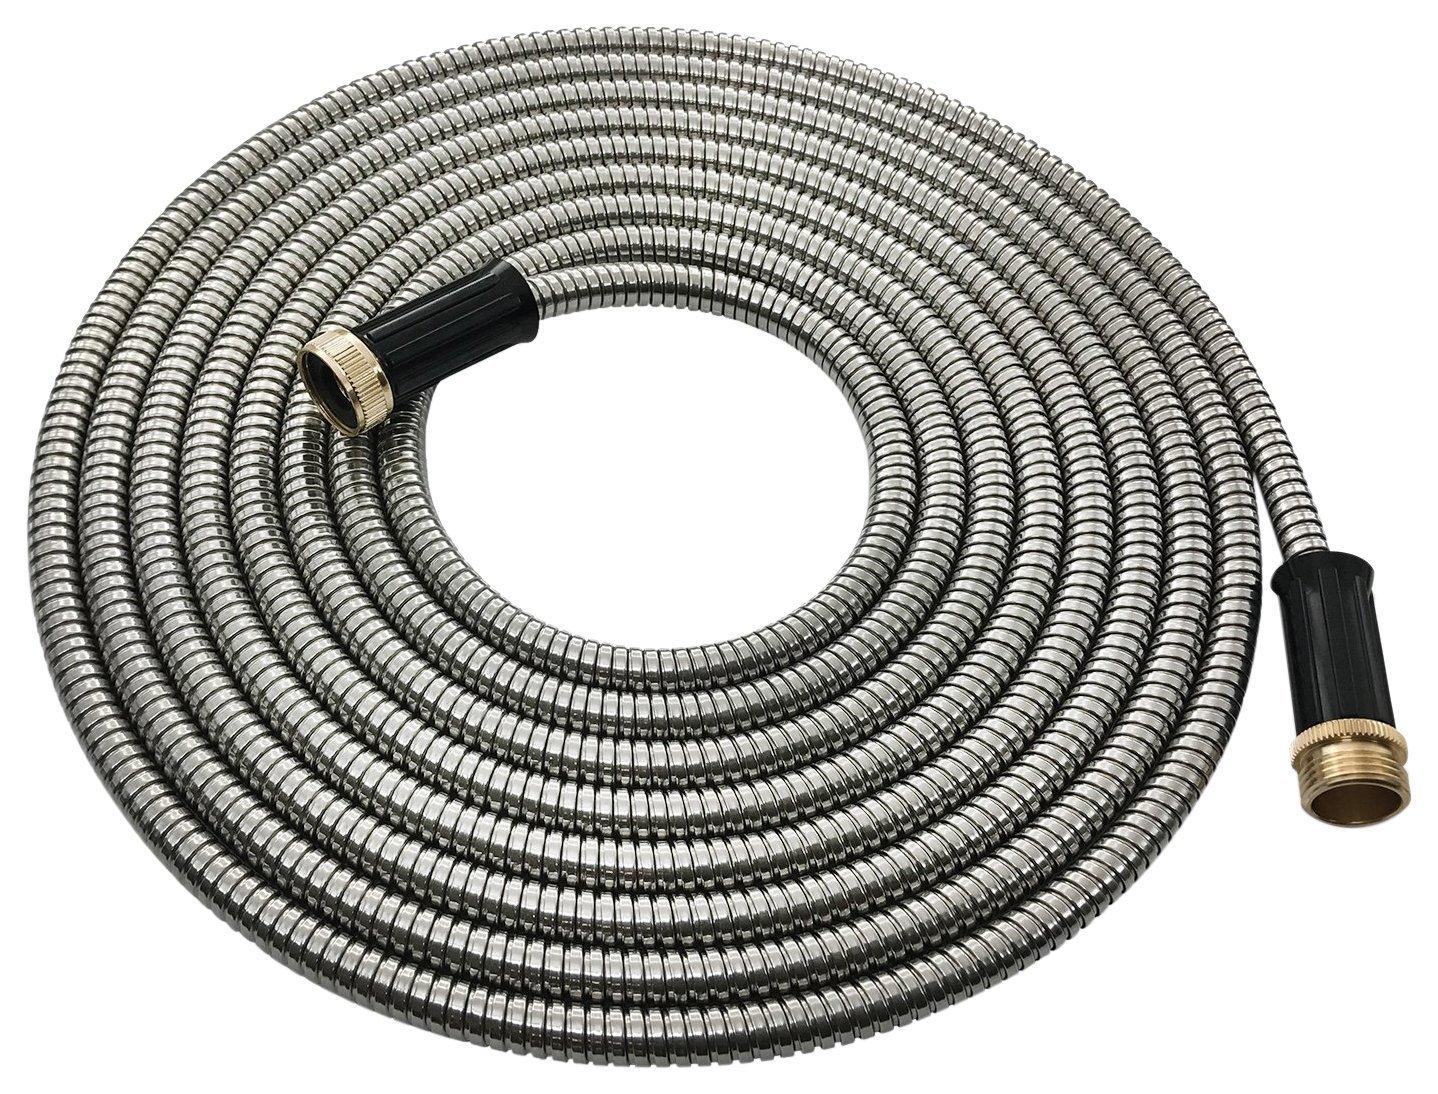 25 Ft Stainless Steel Garden Hose – Lightweight Hose Hero Metal Hose Water Hose